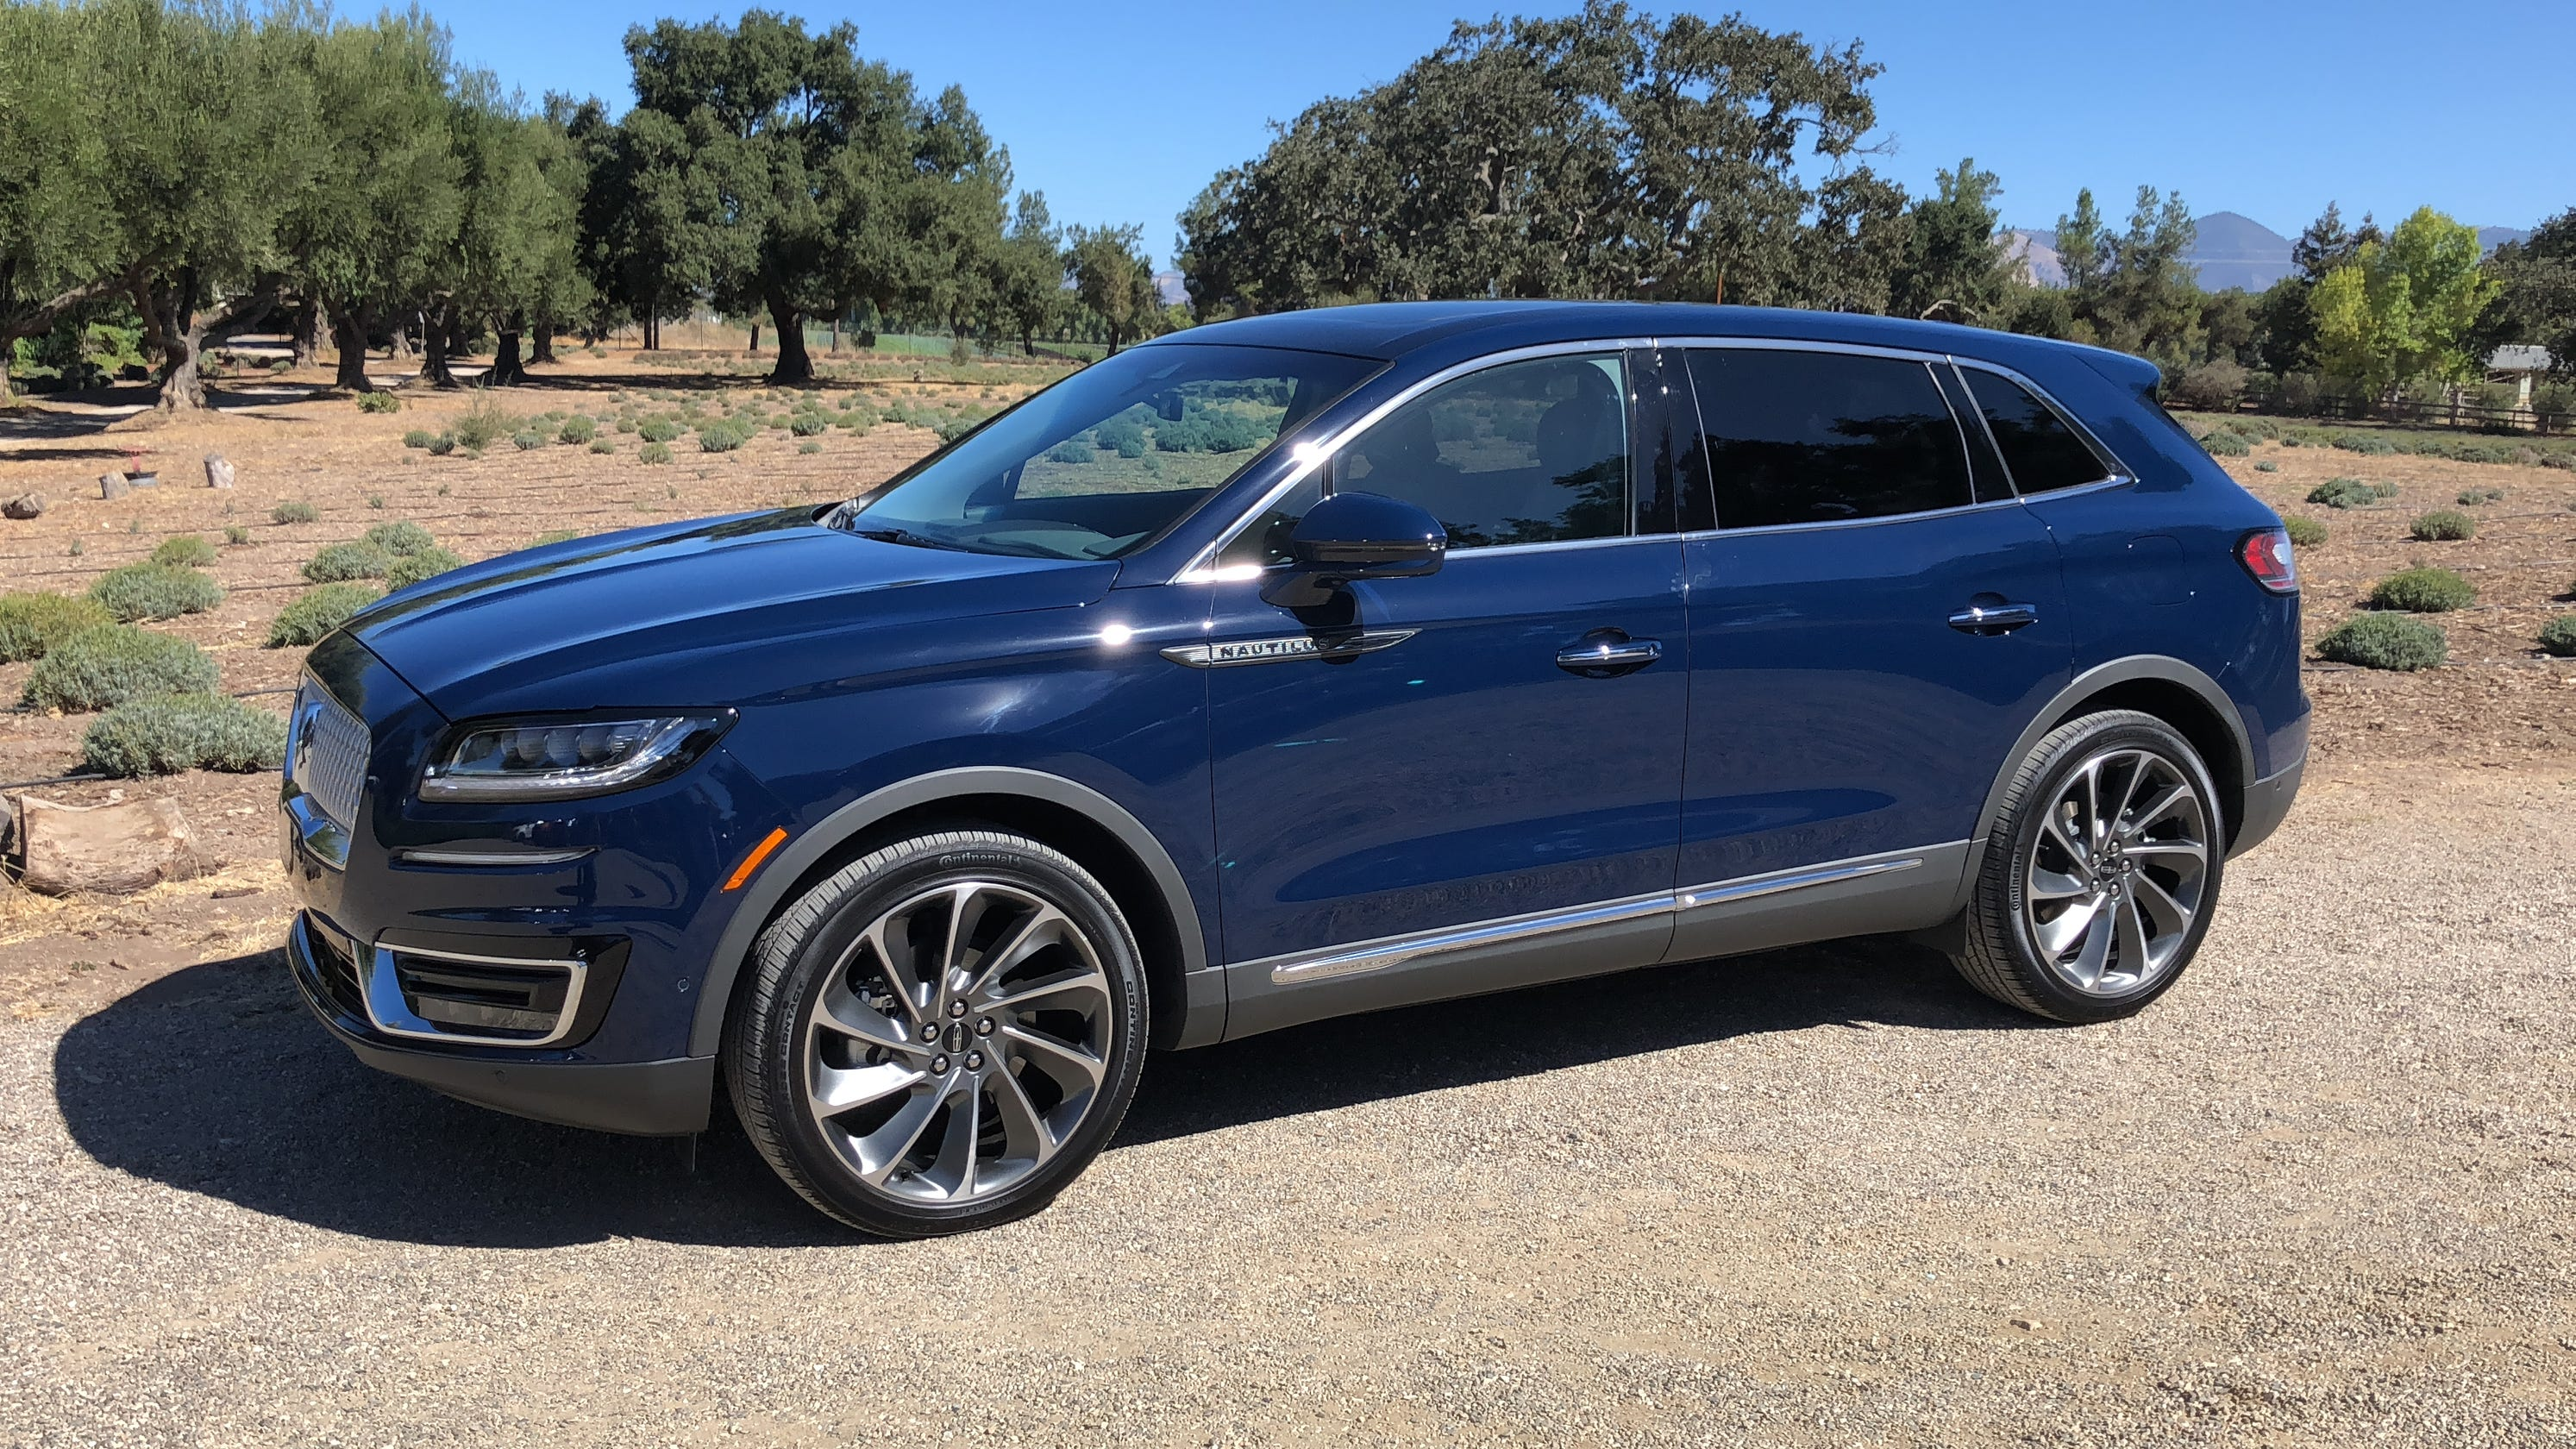 2019 Lincoln Nautilus Improves Safety Fuel Economy